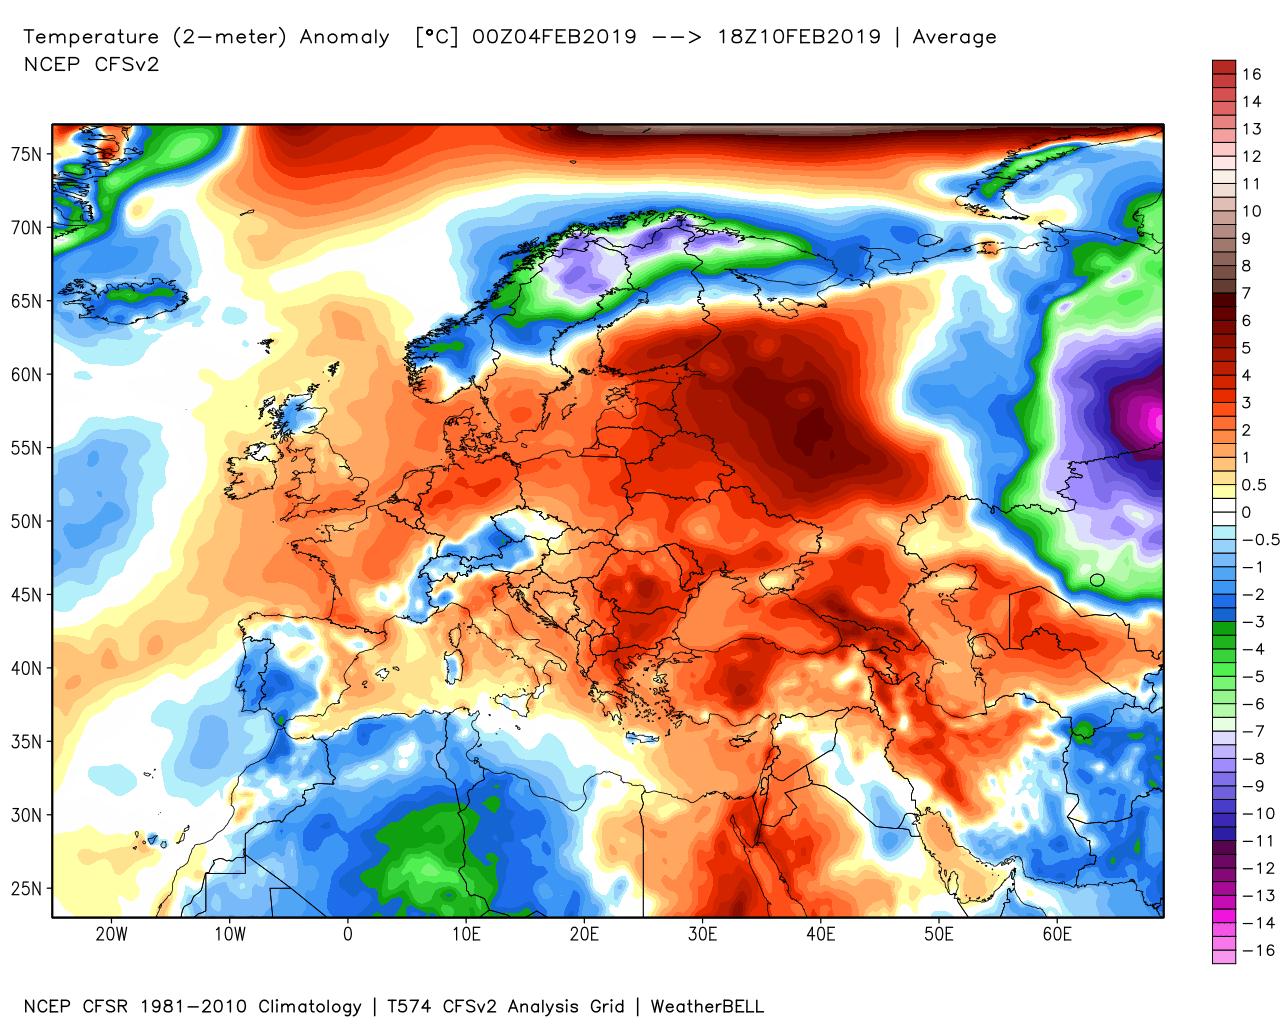 Febbraio 2019: anomalie termiche e pluviometriche-ncep_cfsr_europe_t2m_week_anom.png